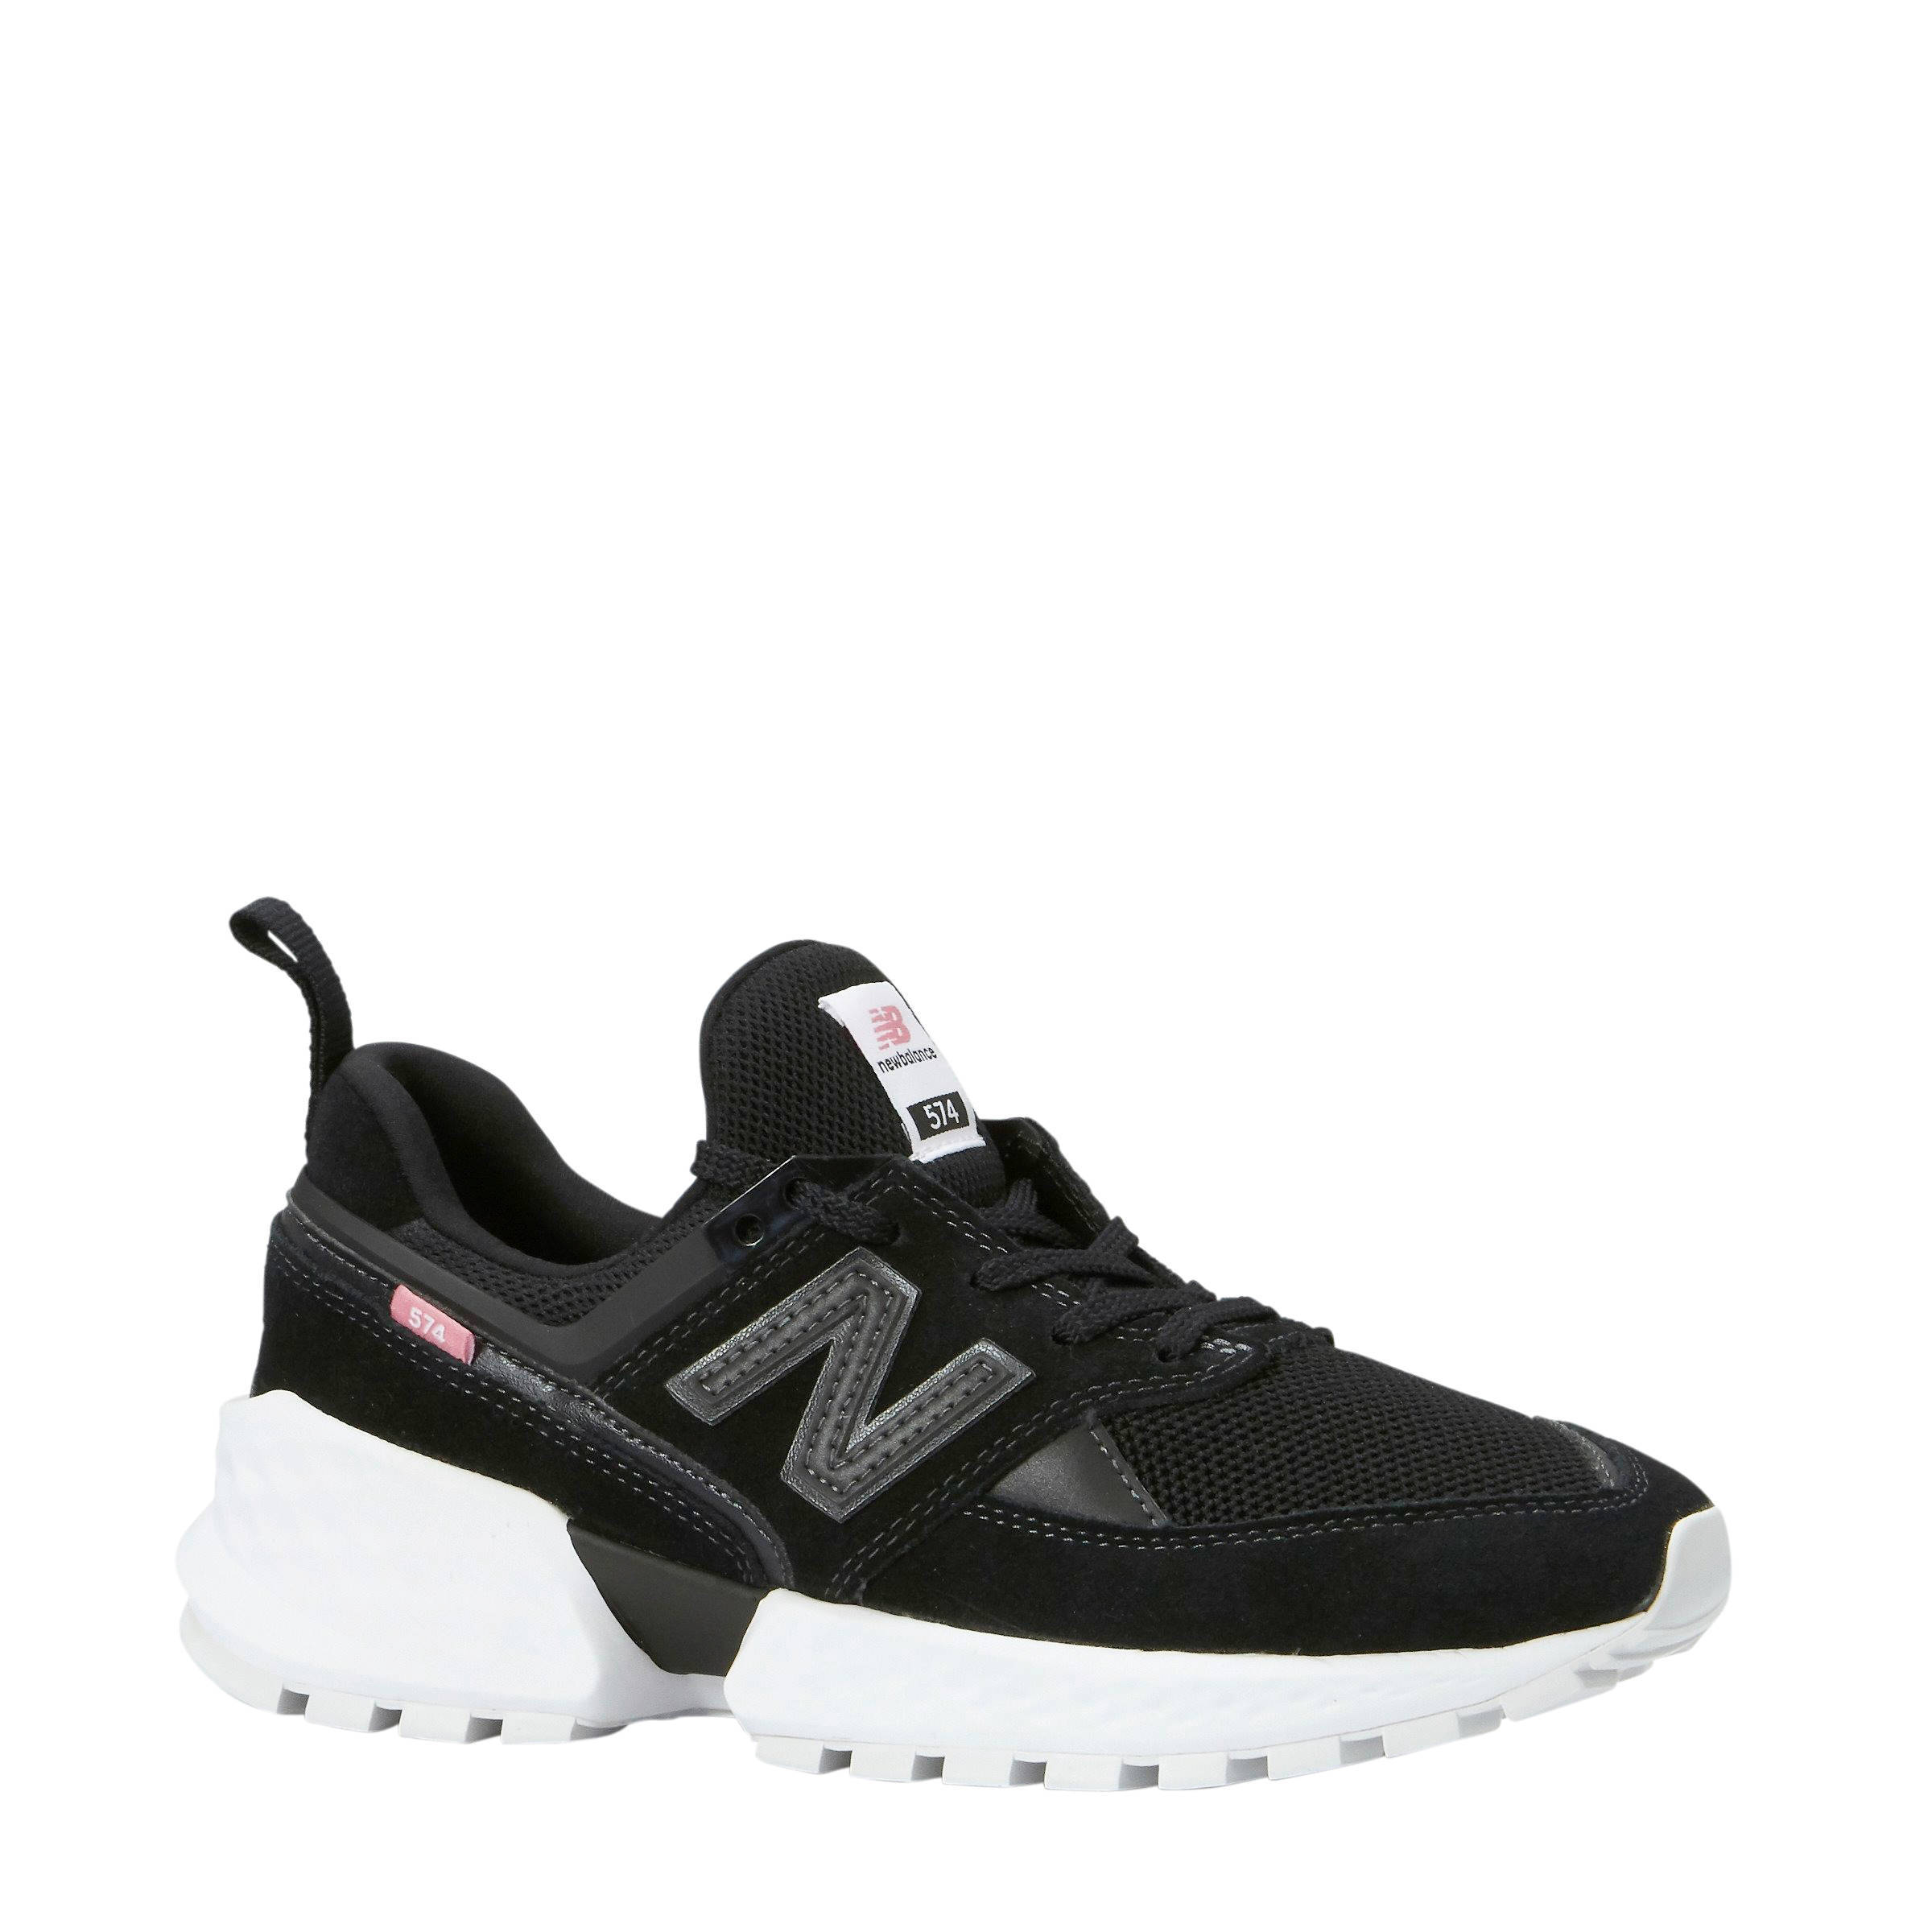 new balance ws574 black dames sneakers zwart